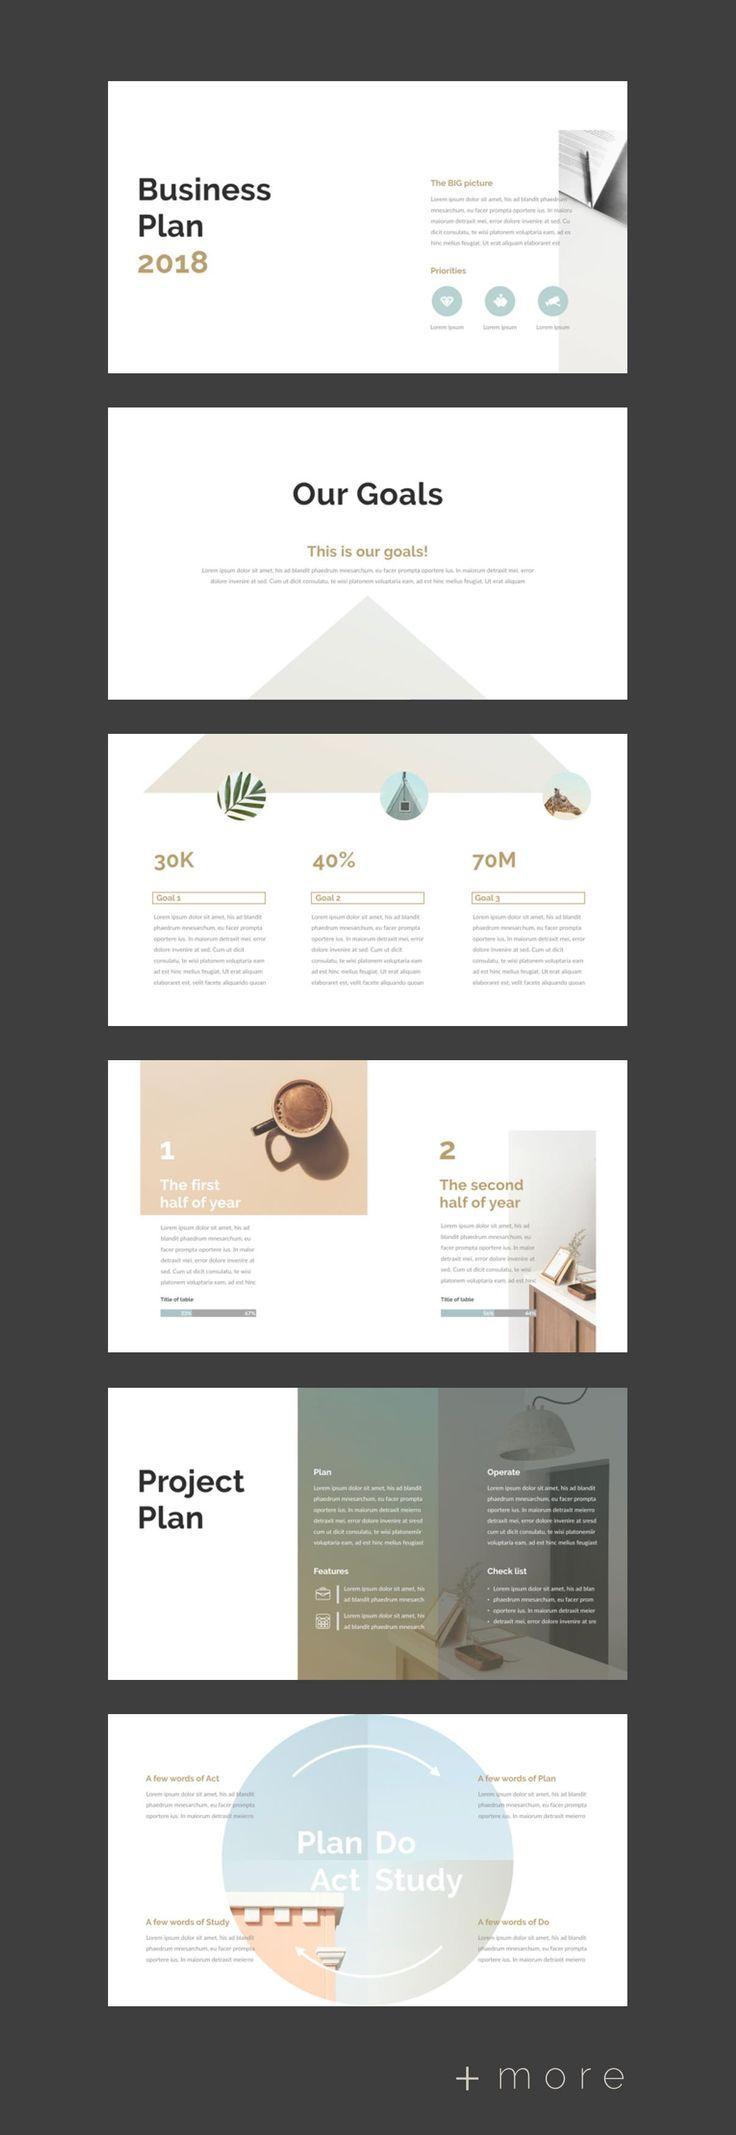 Planner powerpoint template graphic design by kellimage pinterest toneelgroepblik Image collections